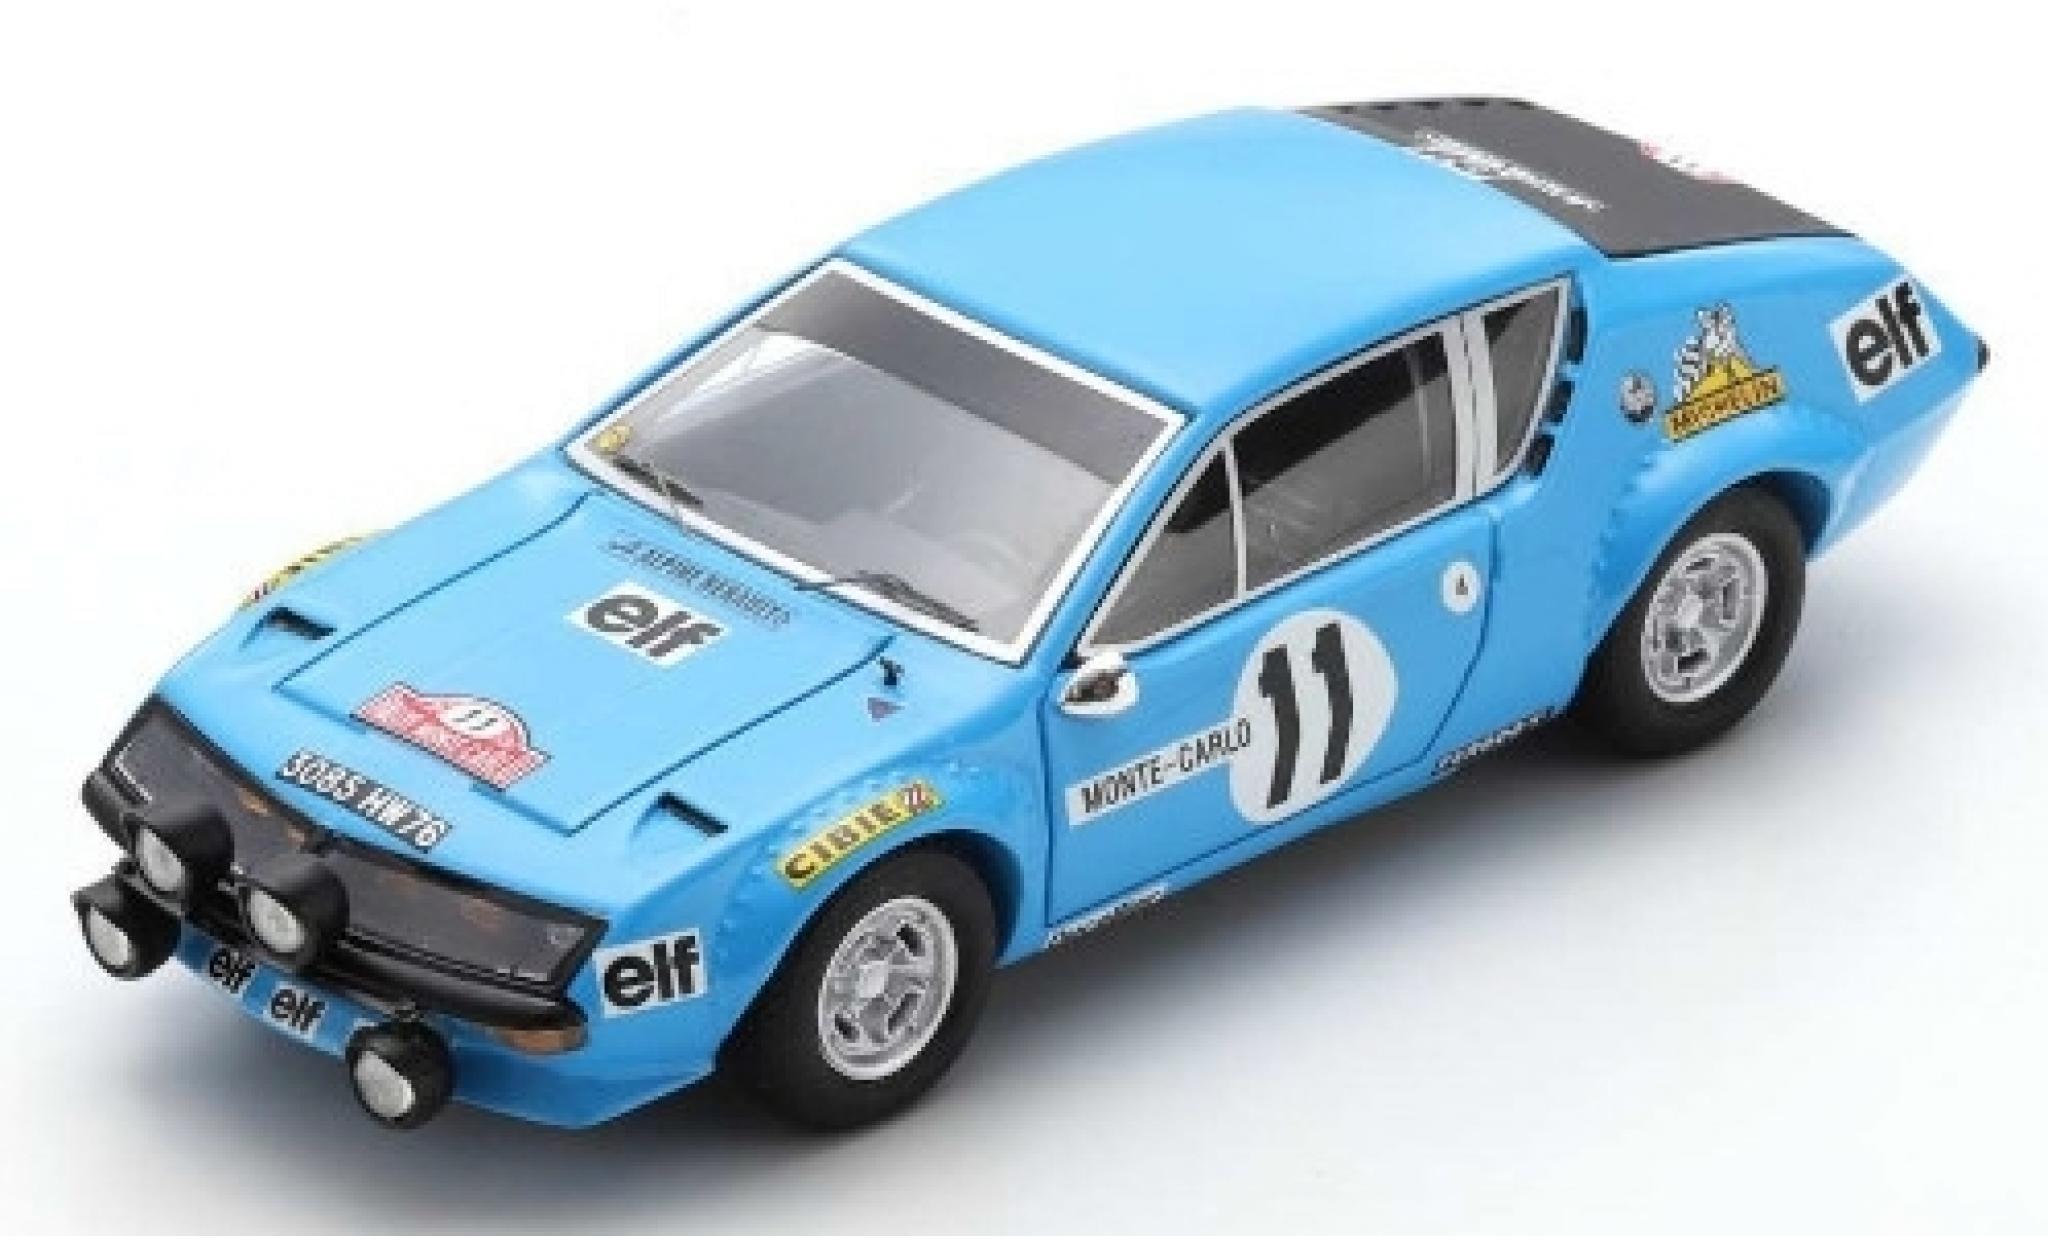 Alpine A310 1/43 Spark No.11 Renault Rallye Monte Carlo 1975 A.Warmbold/J.Davenport